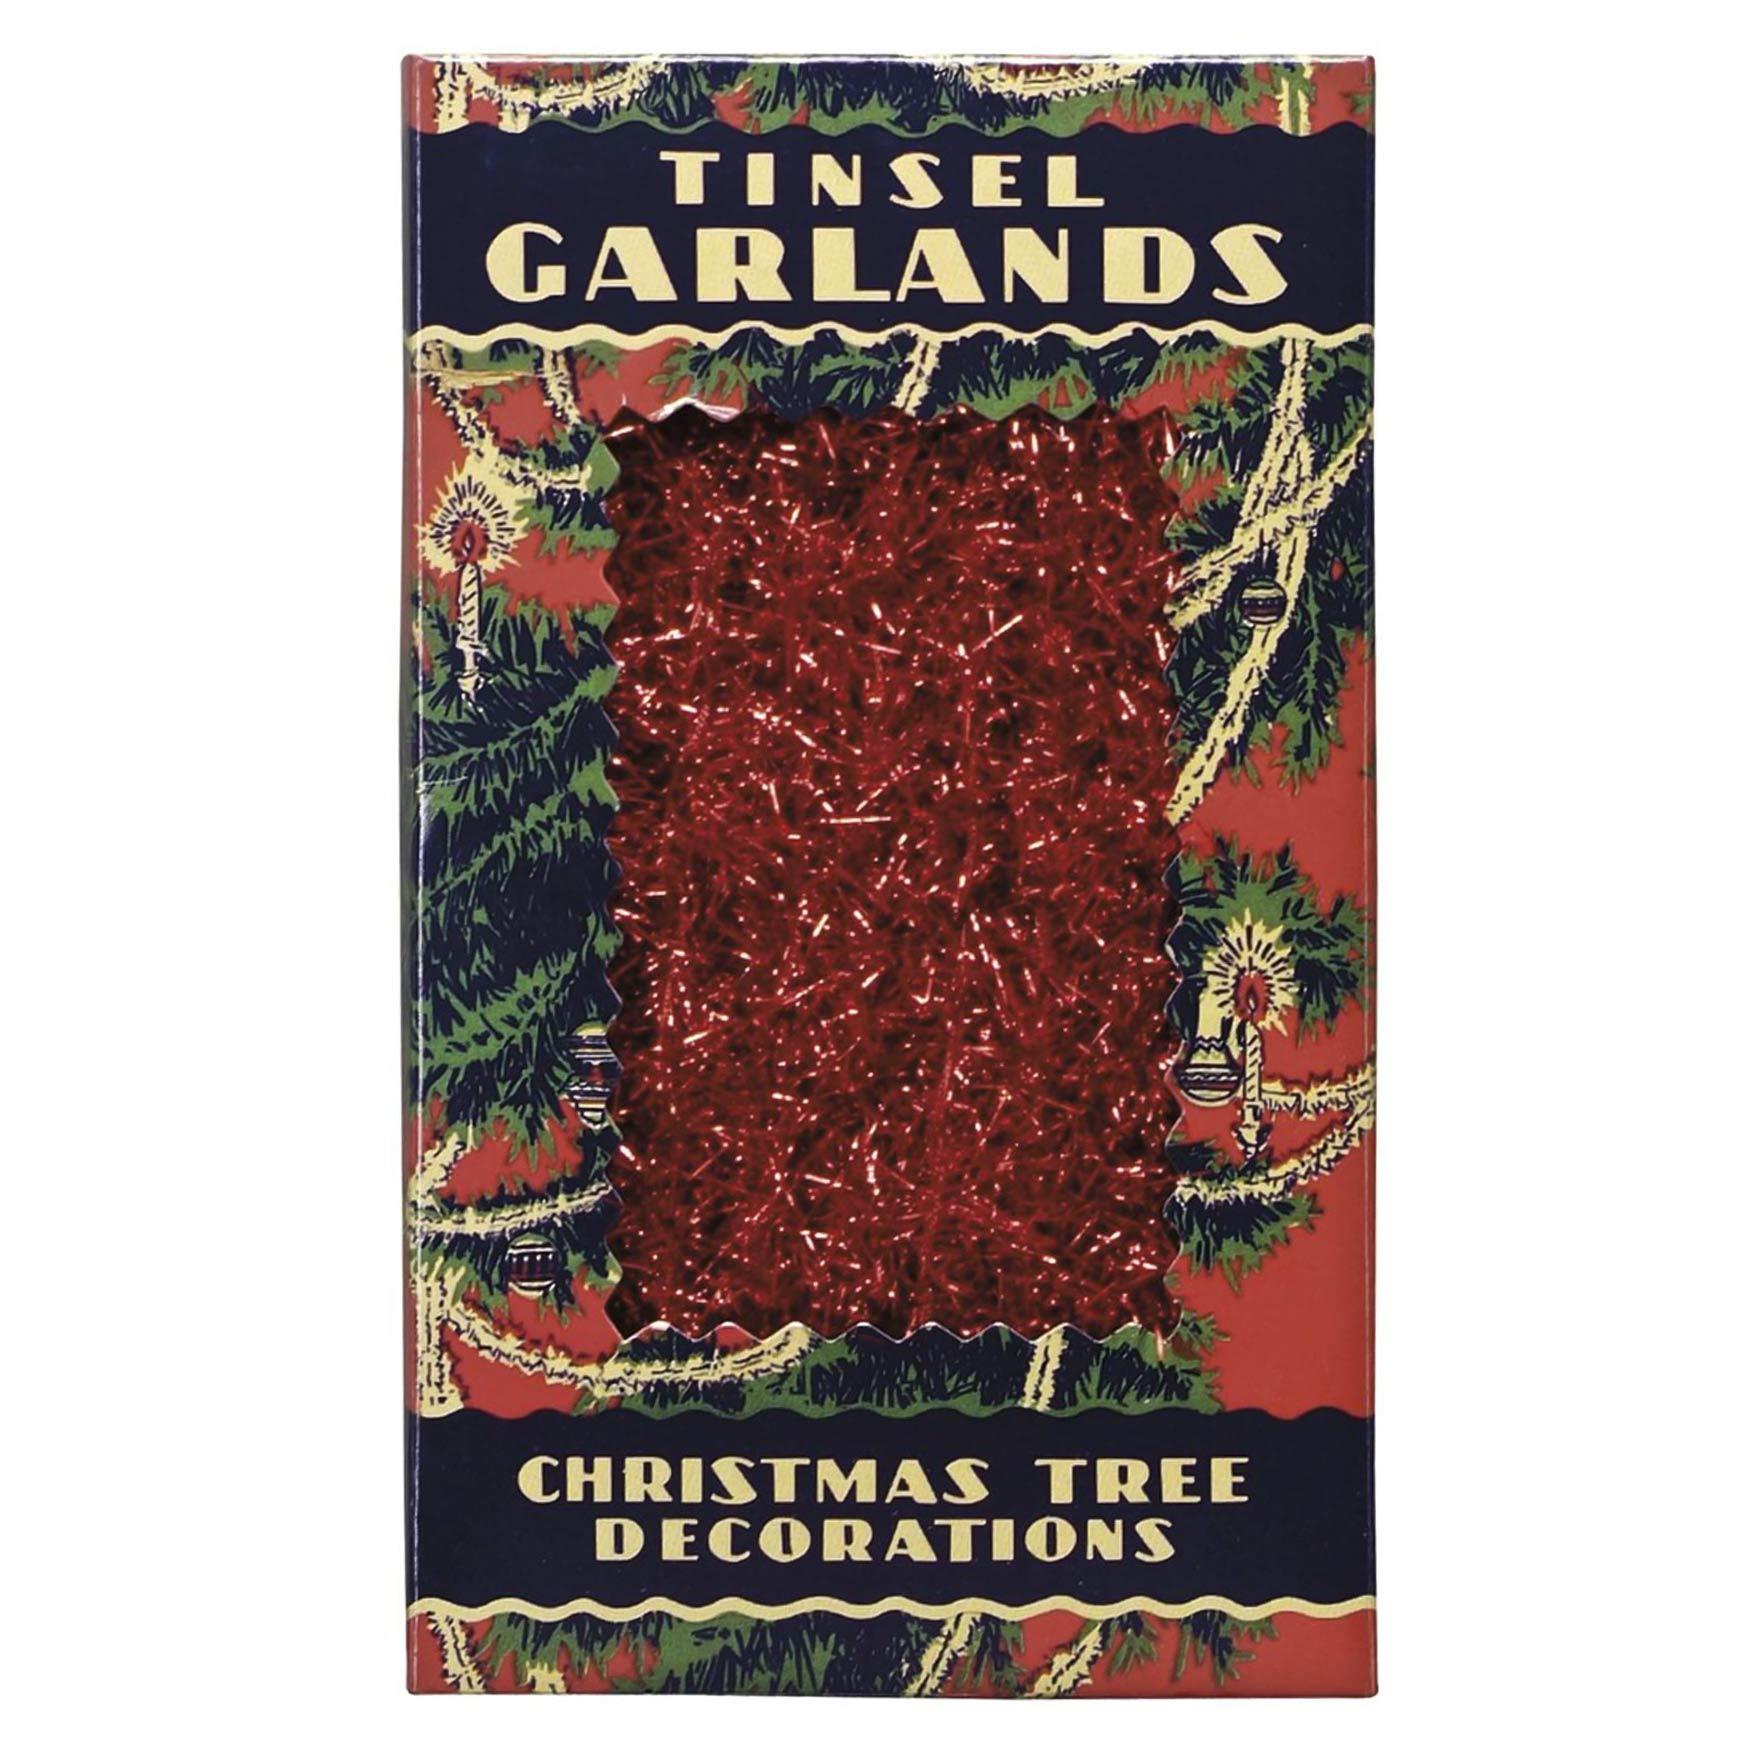 Christmas Decorations Santa Clarita Ca: Antique Vintage 60's Style Tinsel Garland Red Holiday